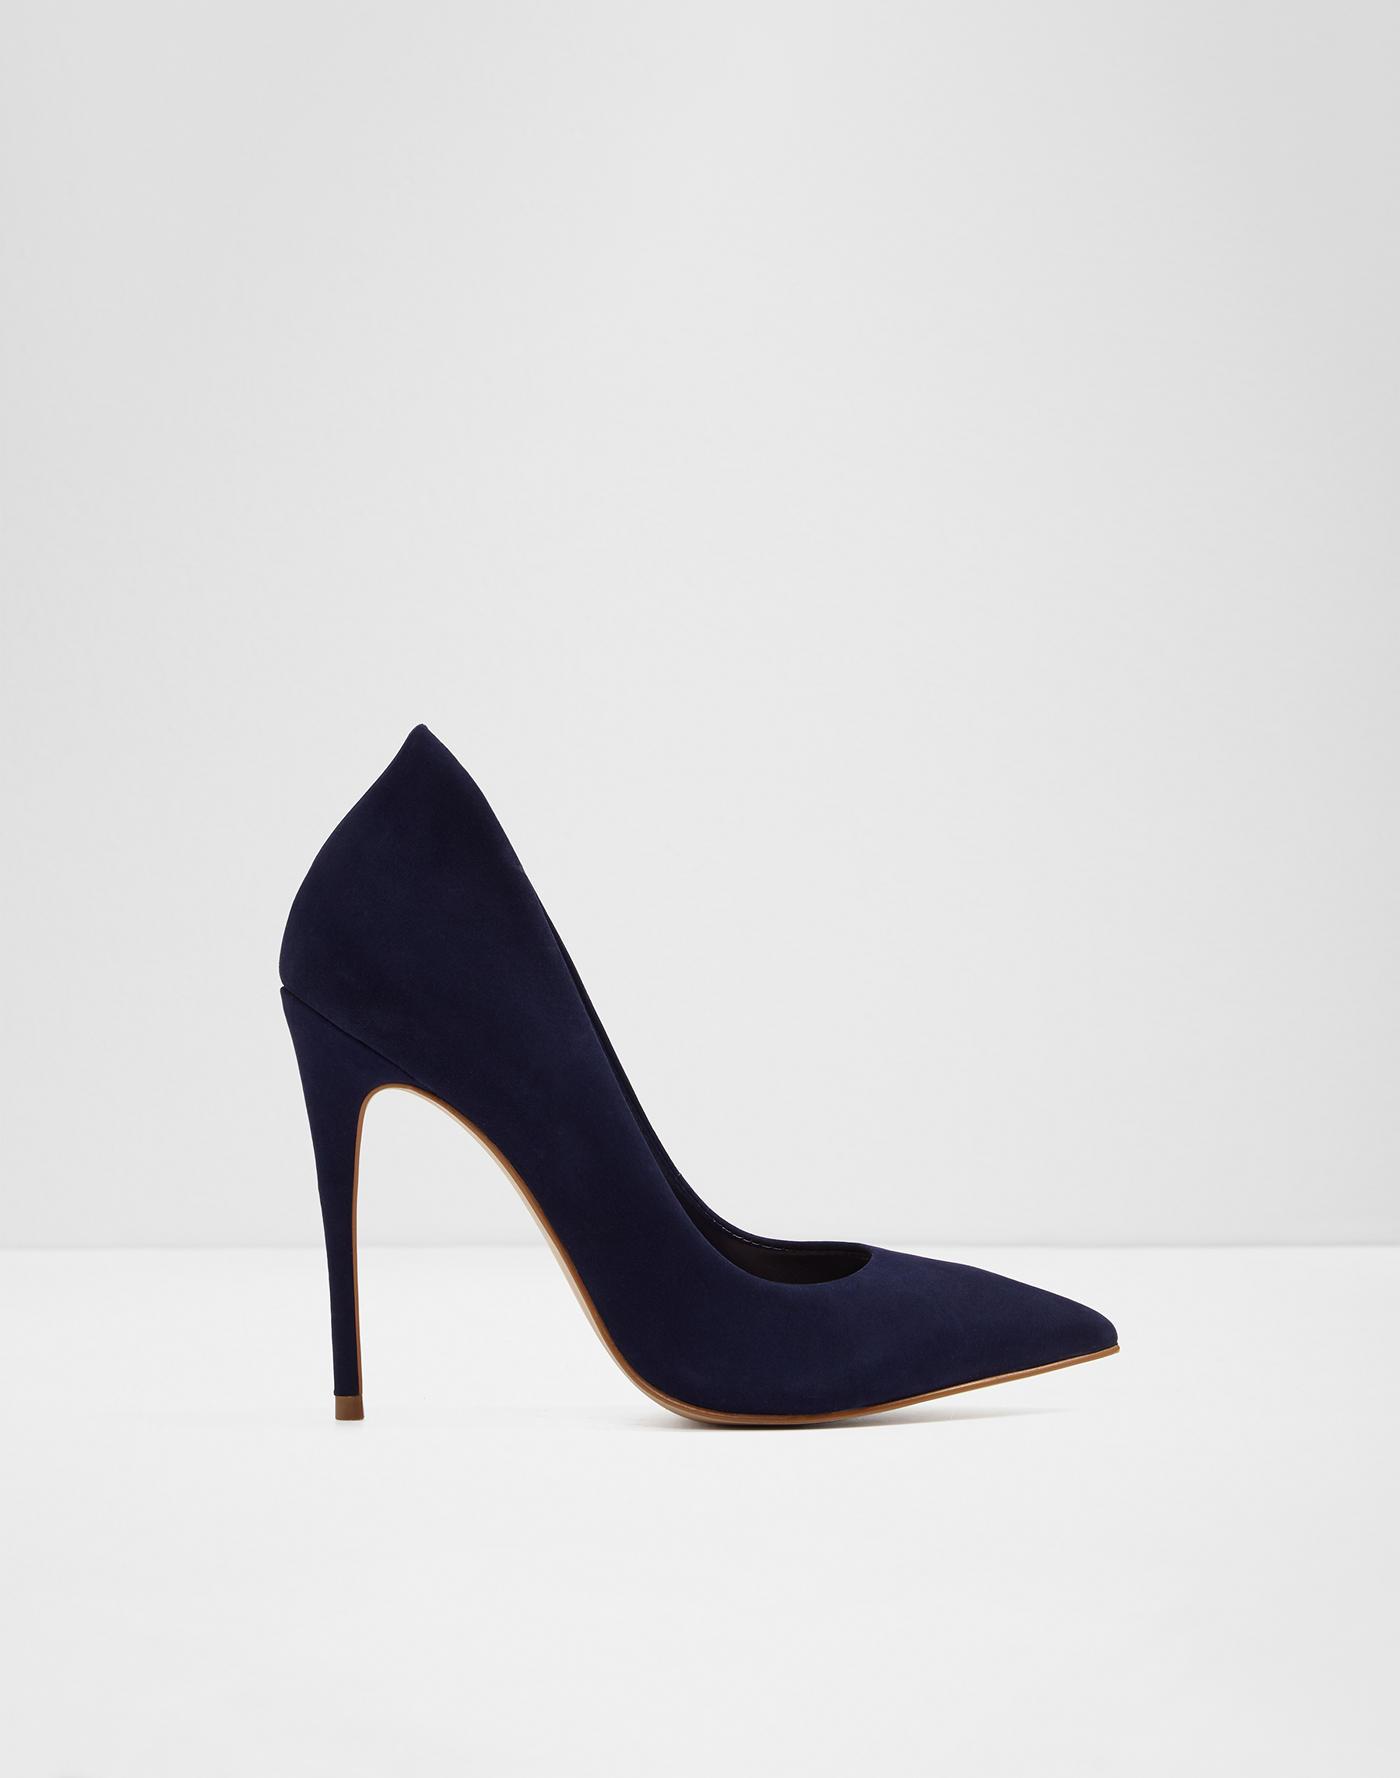 Women's Heels | Black, Red, Nude, Silver Heels | ALDO US